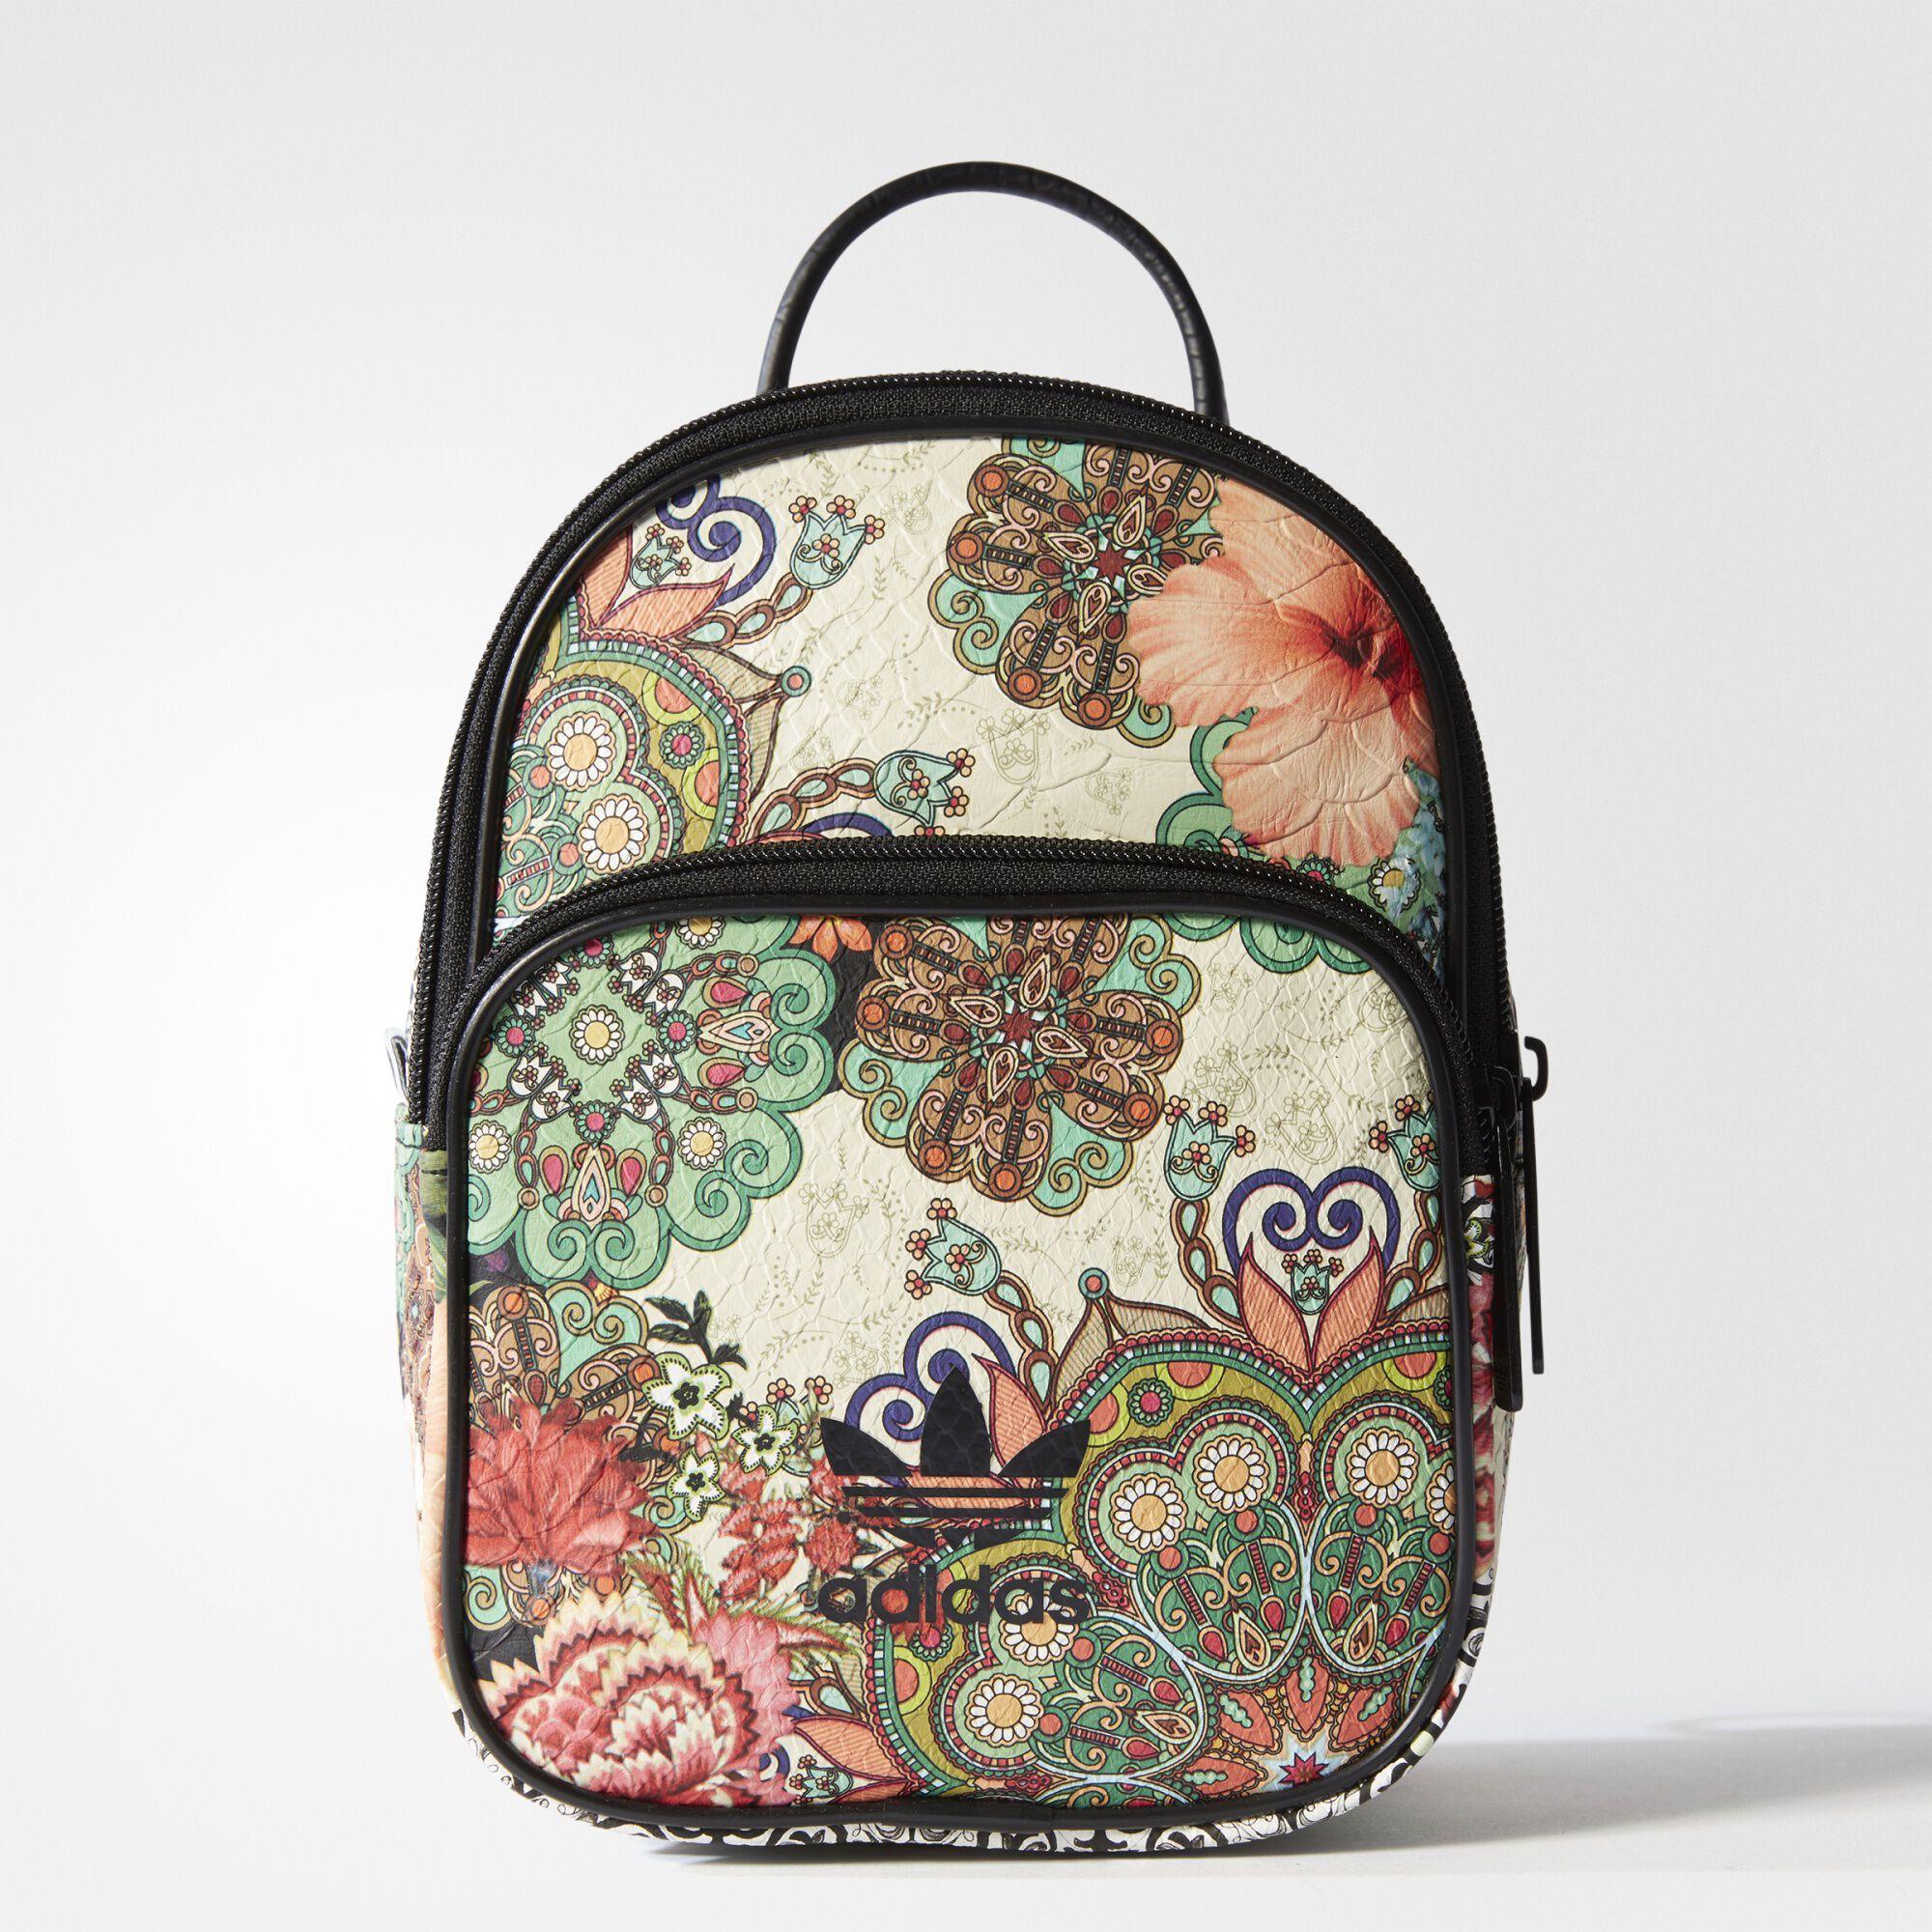 Sale Long Champ Backpack Longchamp Le Pliage Neo Small Handbag 1512578545 Red